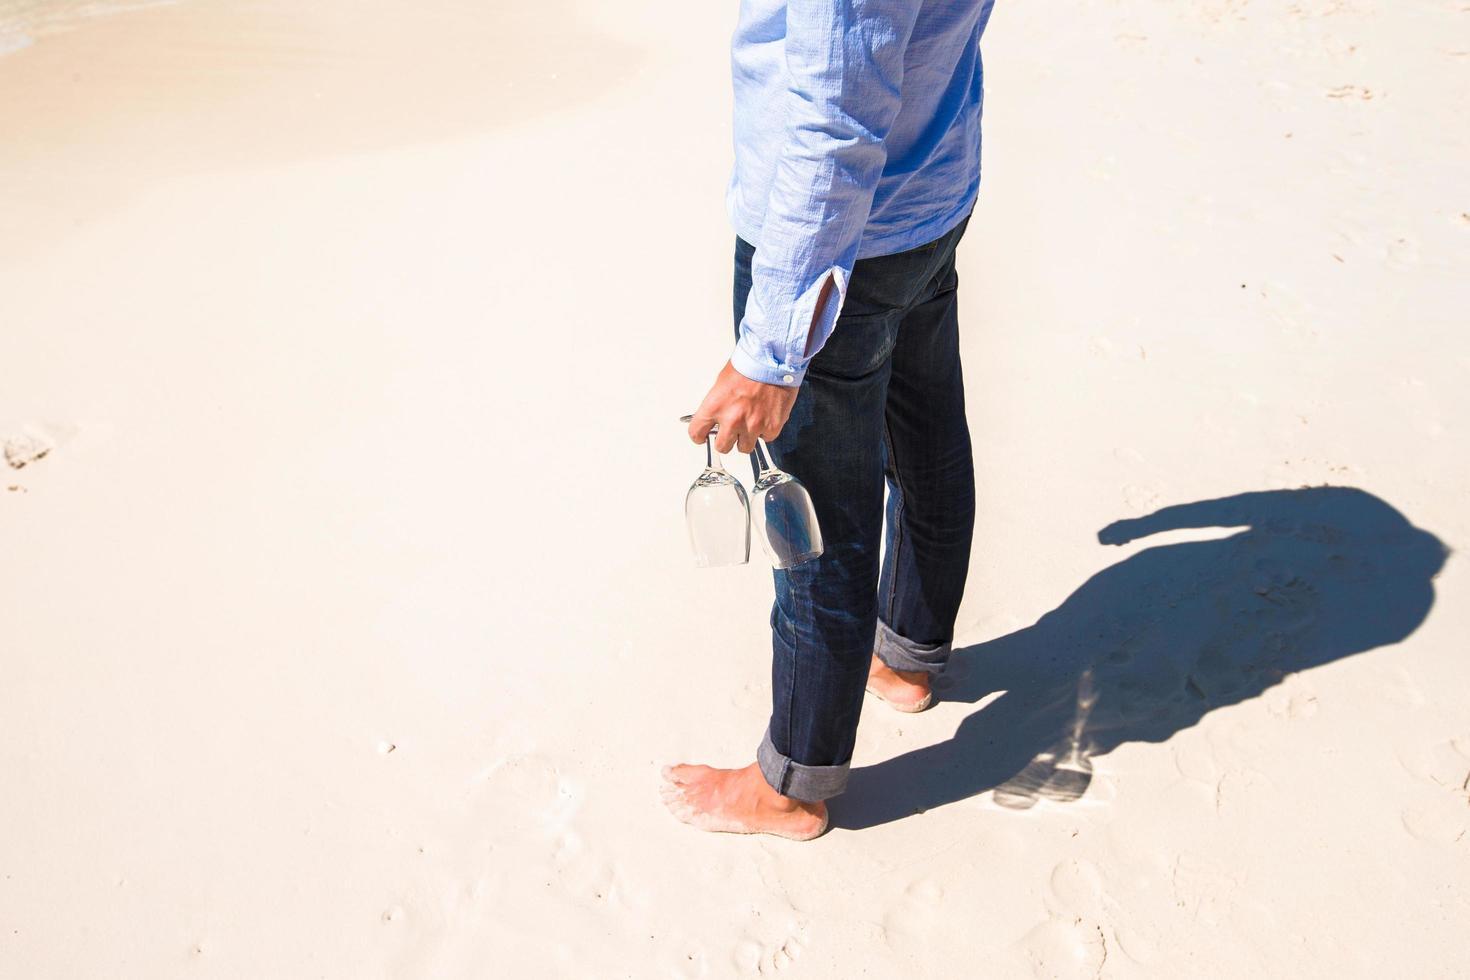 Mann hält Weingläser an einem Strand foto